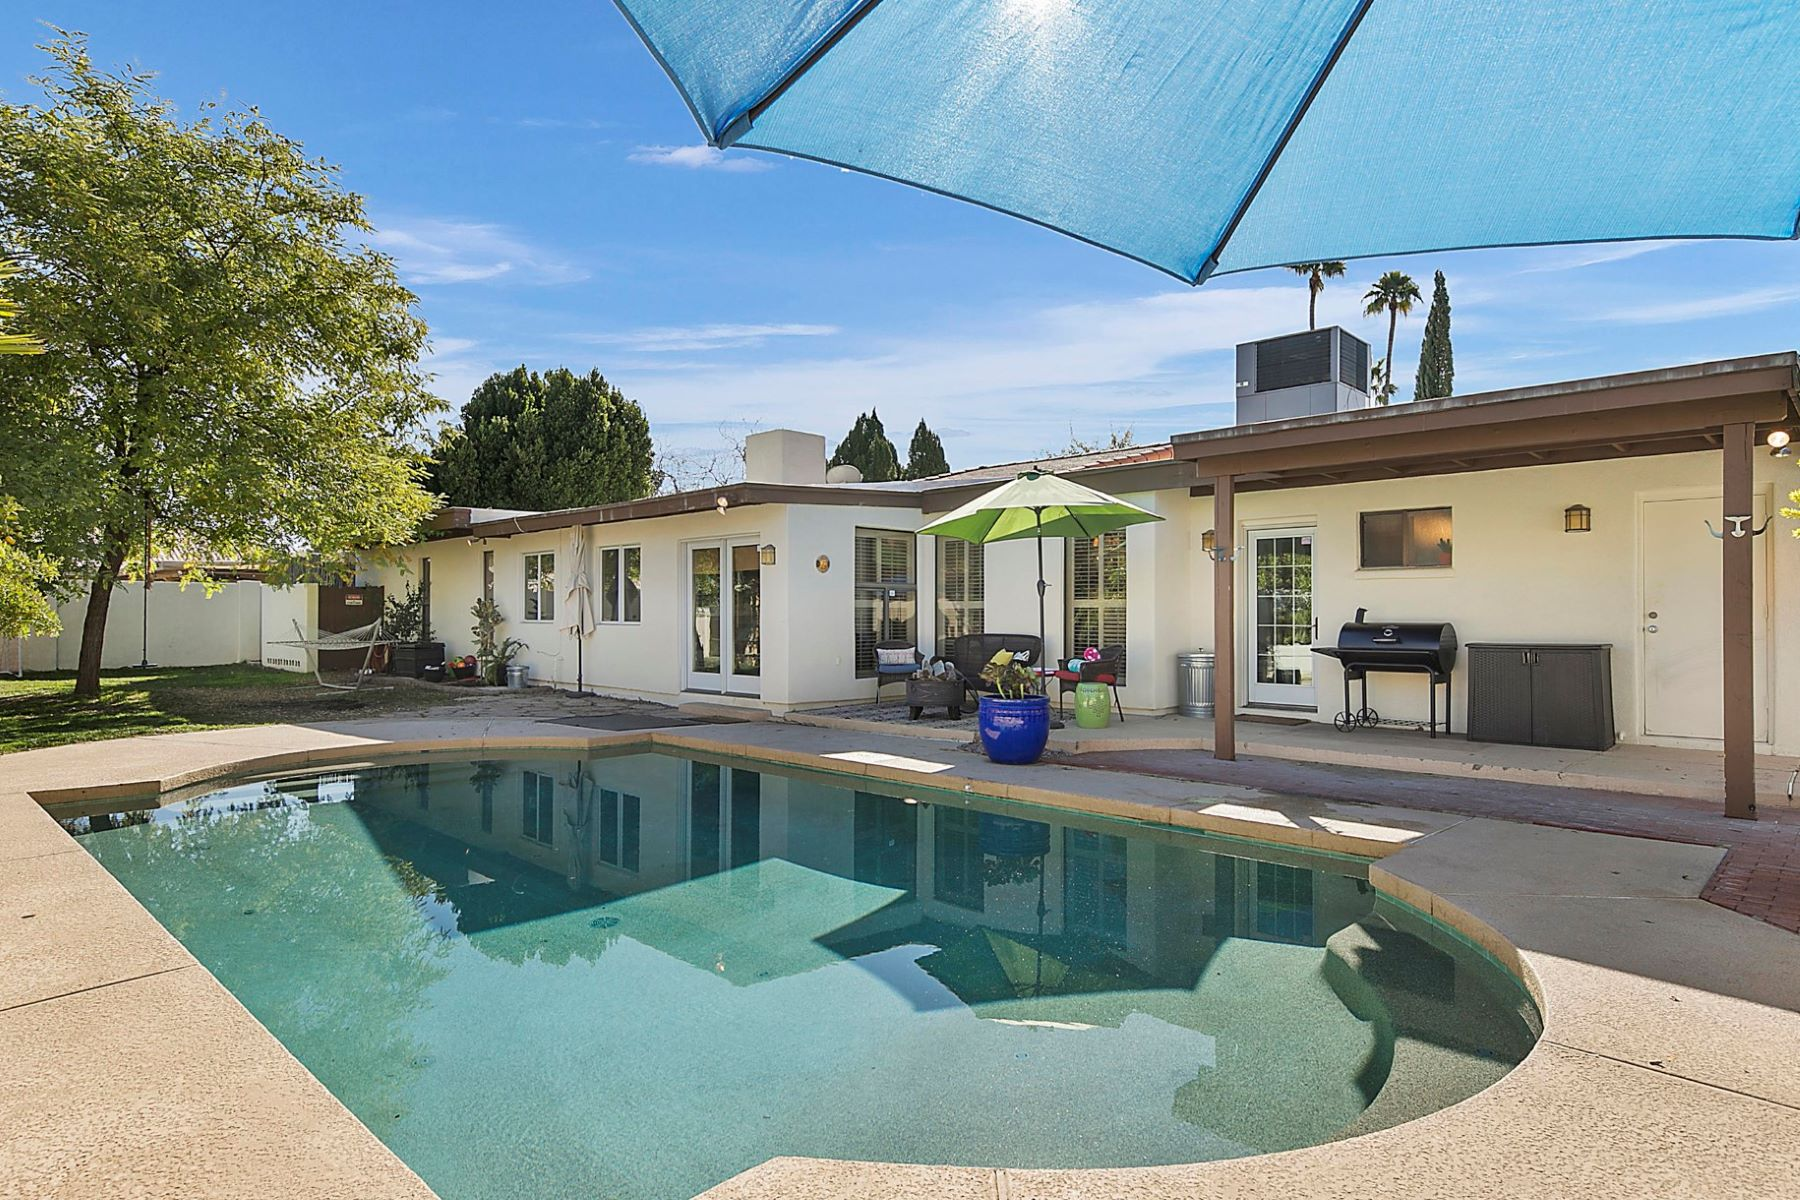 Single Family Homes for Active at Estate La Colina 1874 E CARVER RD Tempe, Arizona 85284 United States